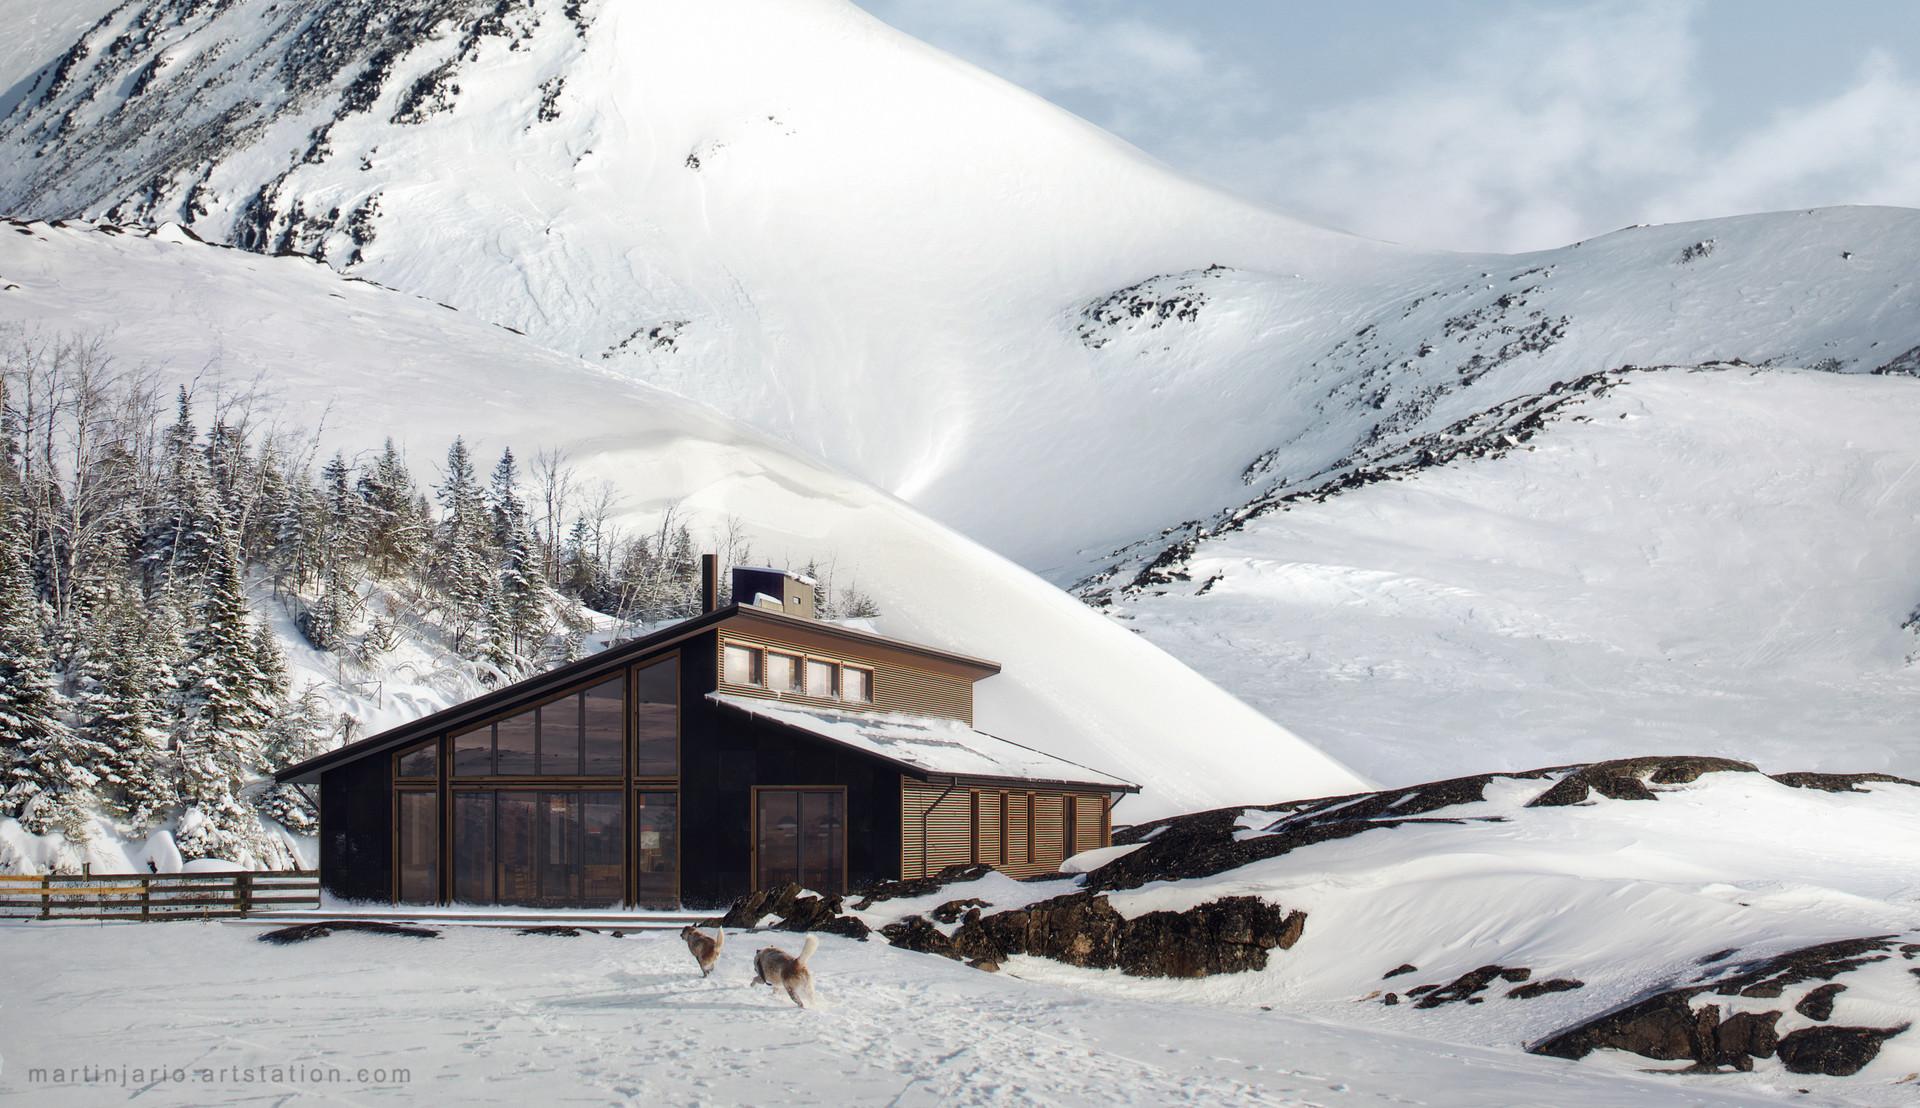 Martin jario artstation martinjario snowy mountains b